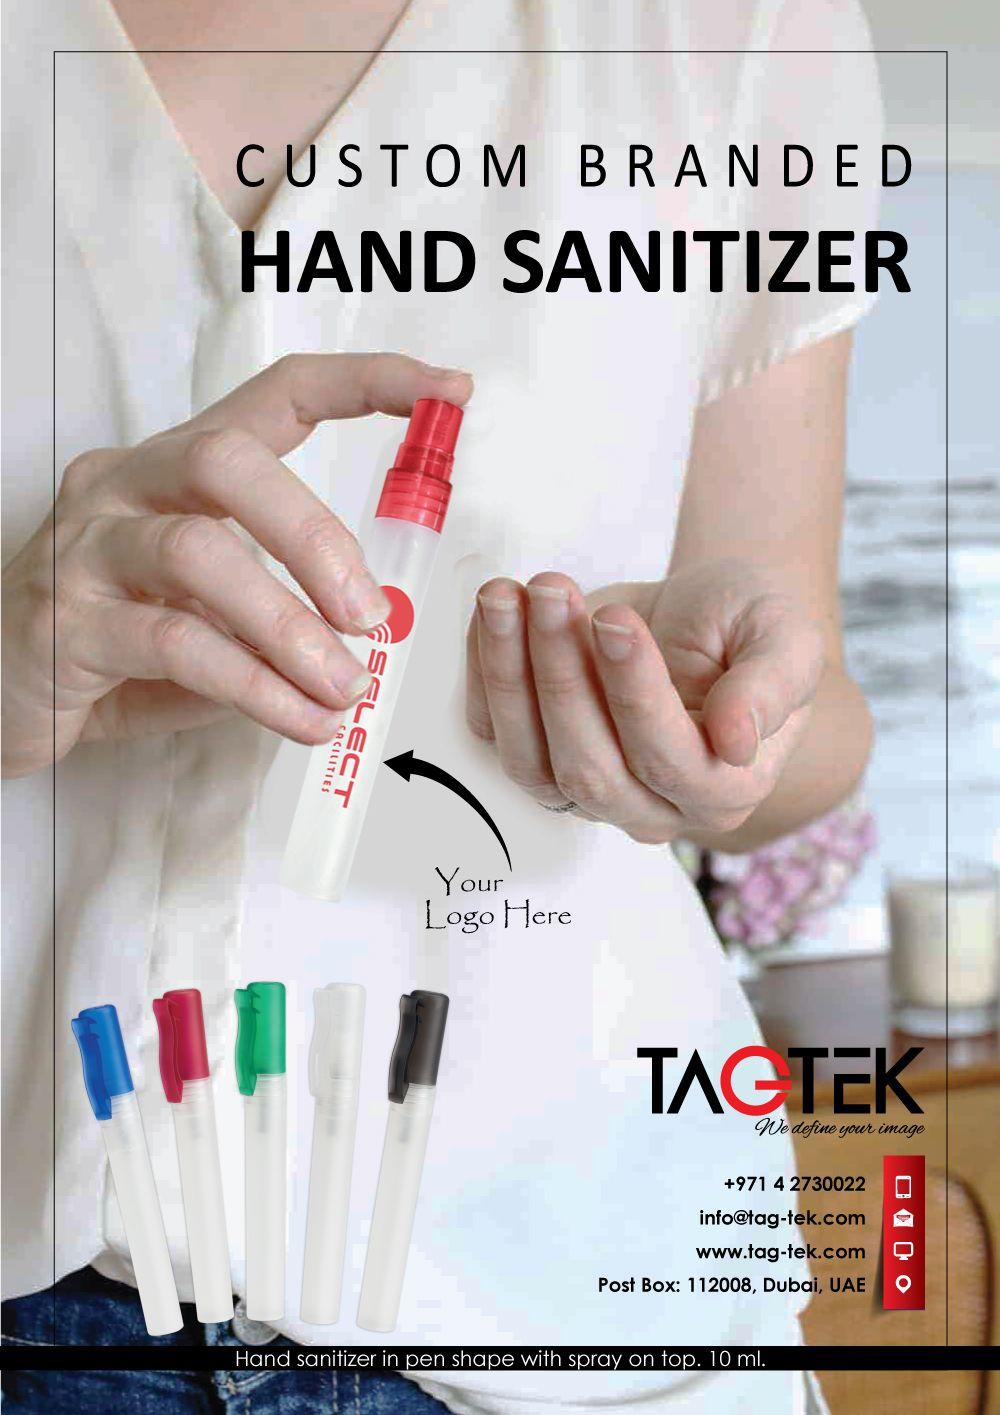 Personalized Metallics Credit Card Press Spray Hand Sanitizer